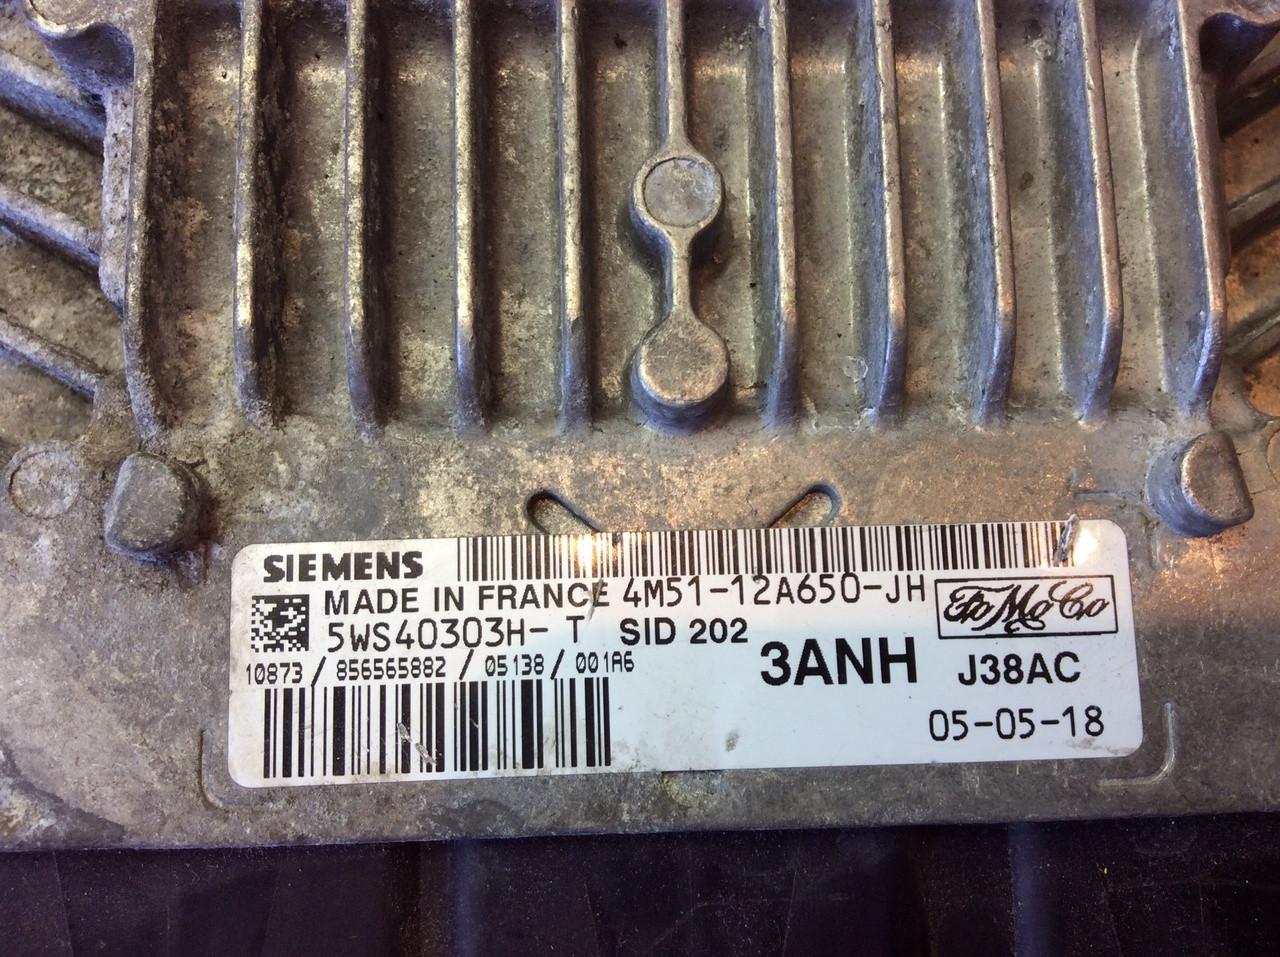 Plug & Play Ford Focus 1 8 TDCI, Siemens Engine ECU, SID202, 5WS40303H-T,  4M51-12A650-JH, 3ANH